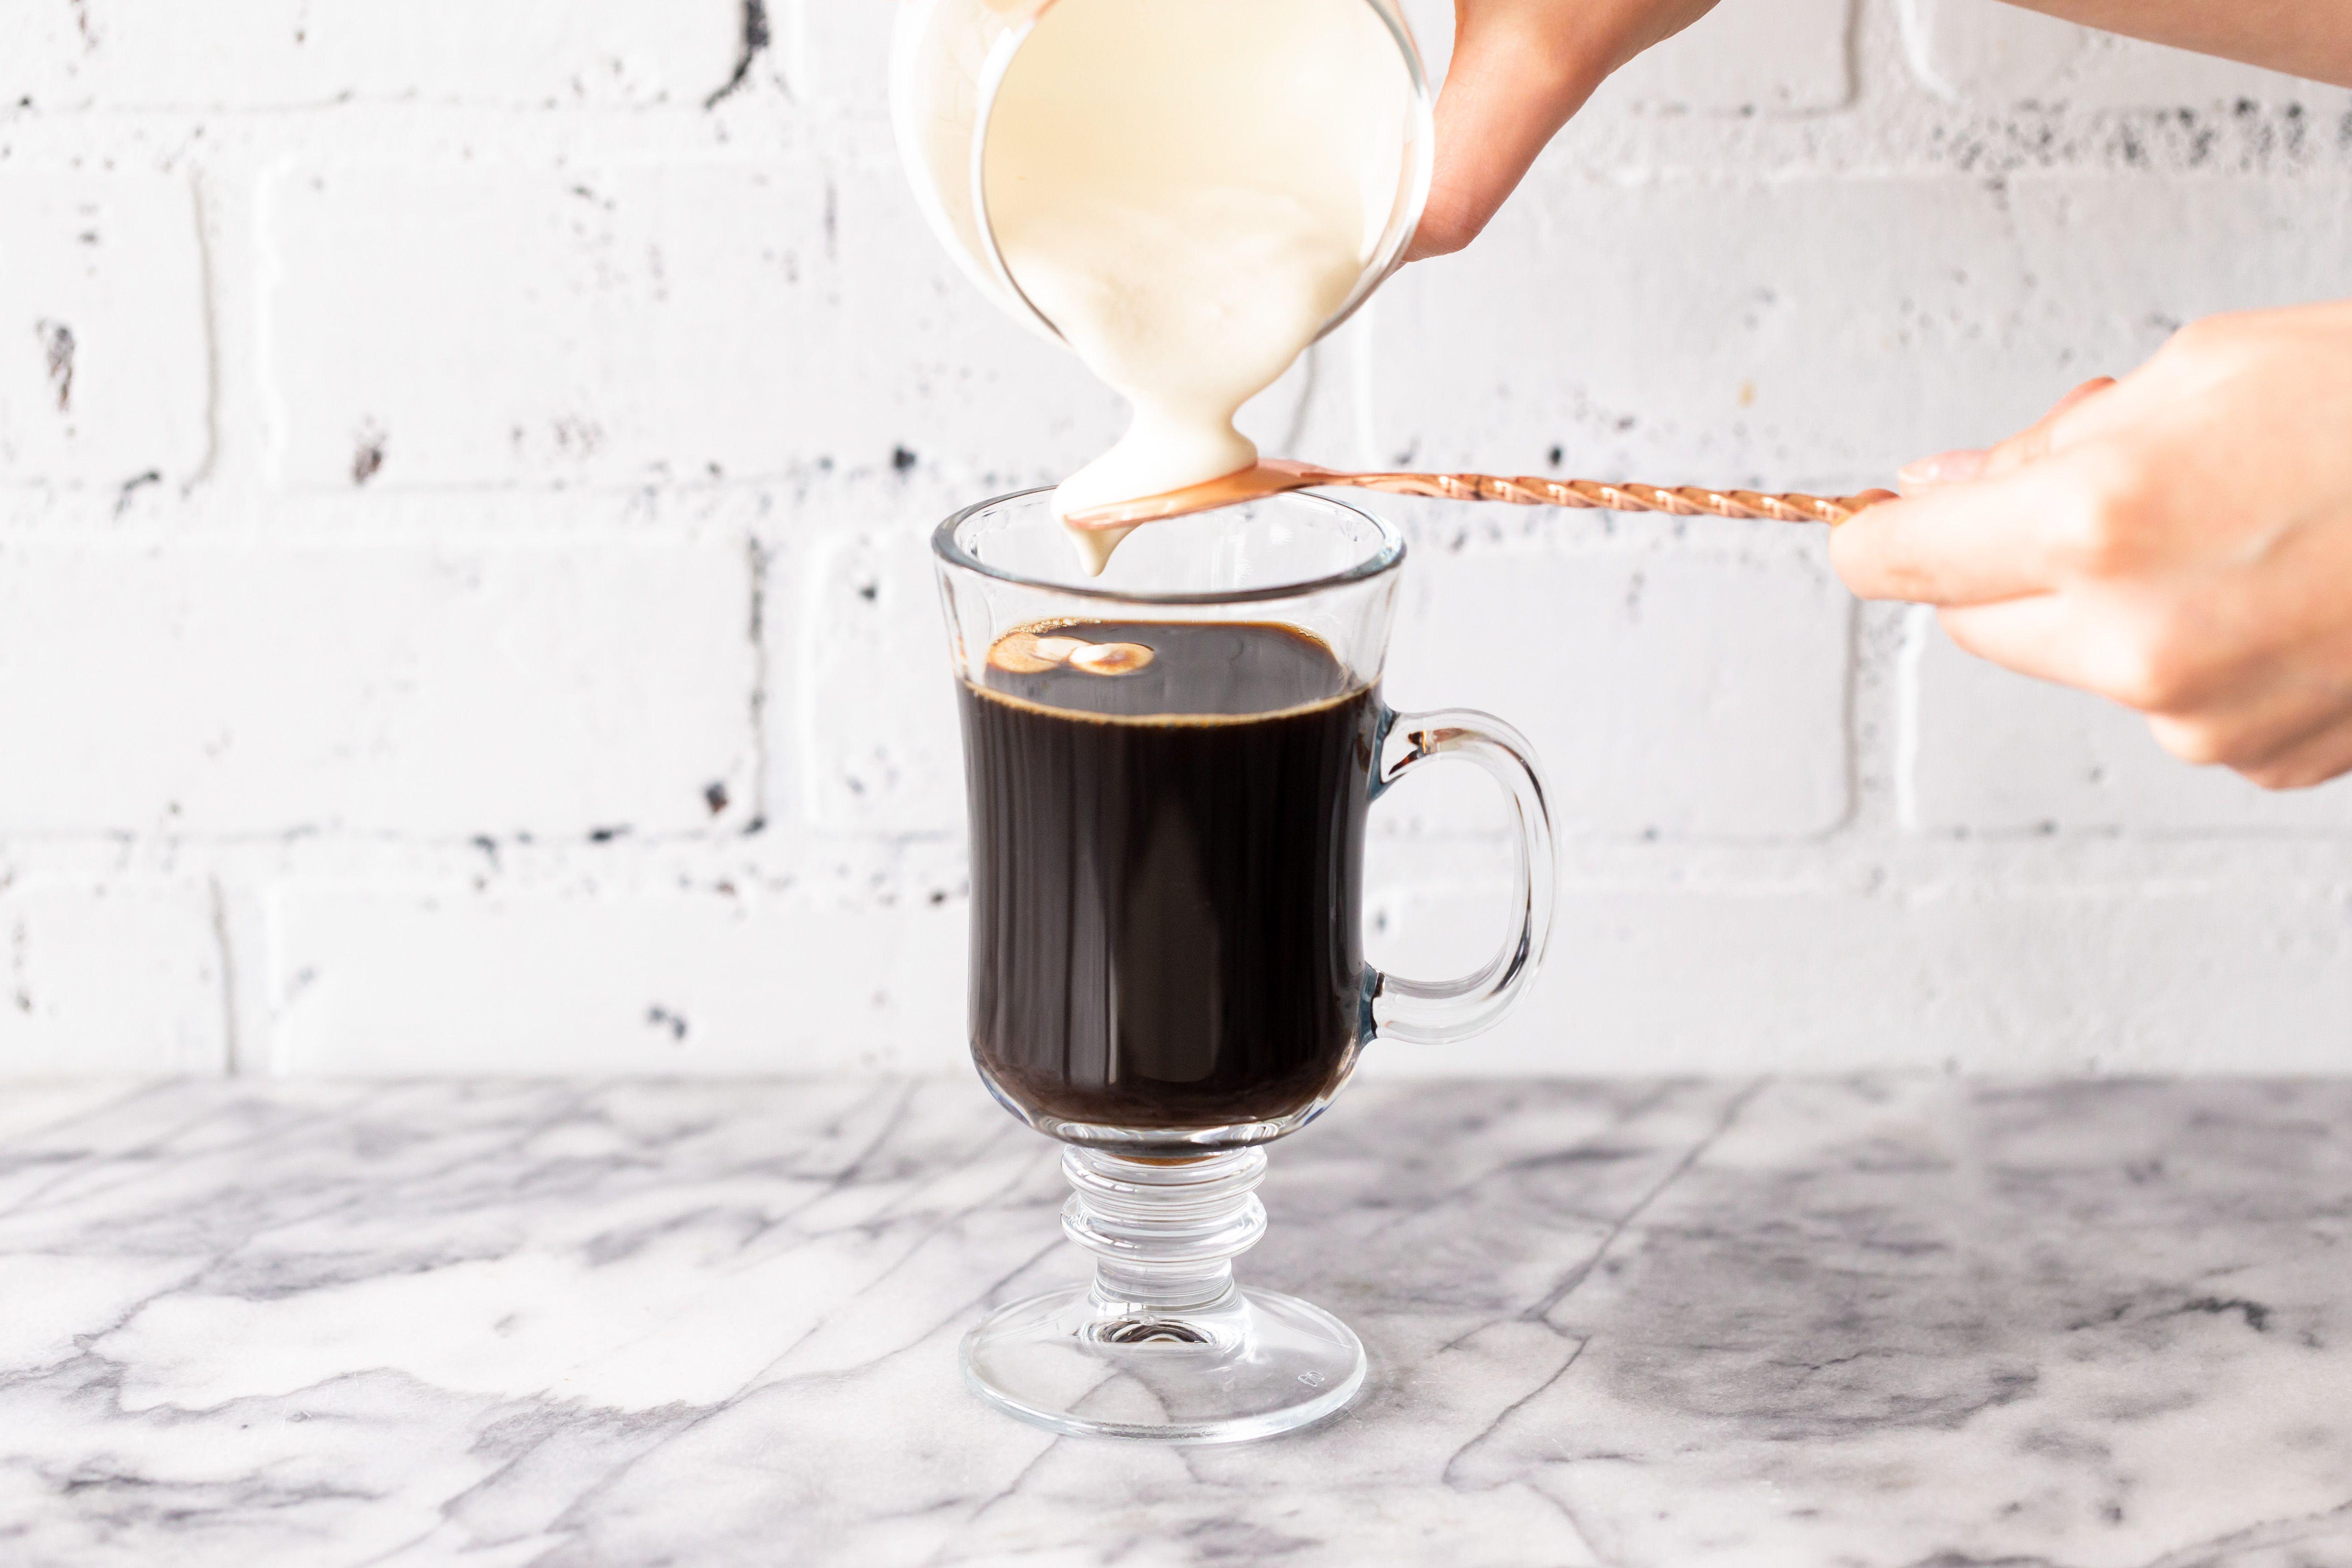 Pour cream over a spoon into Irish whiskey